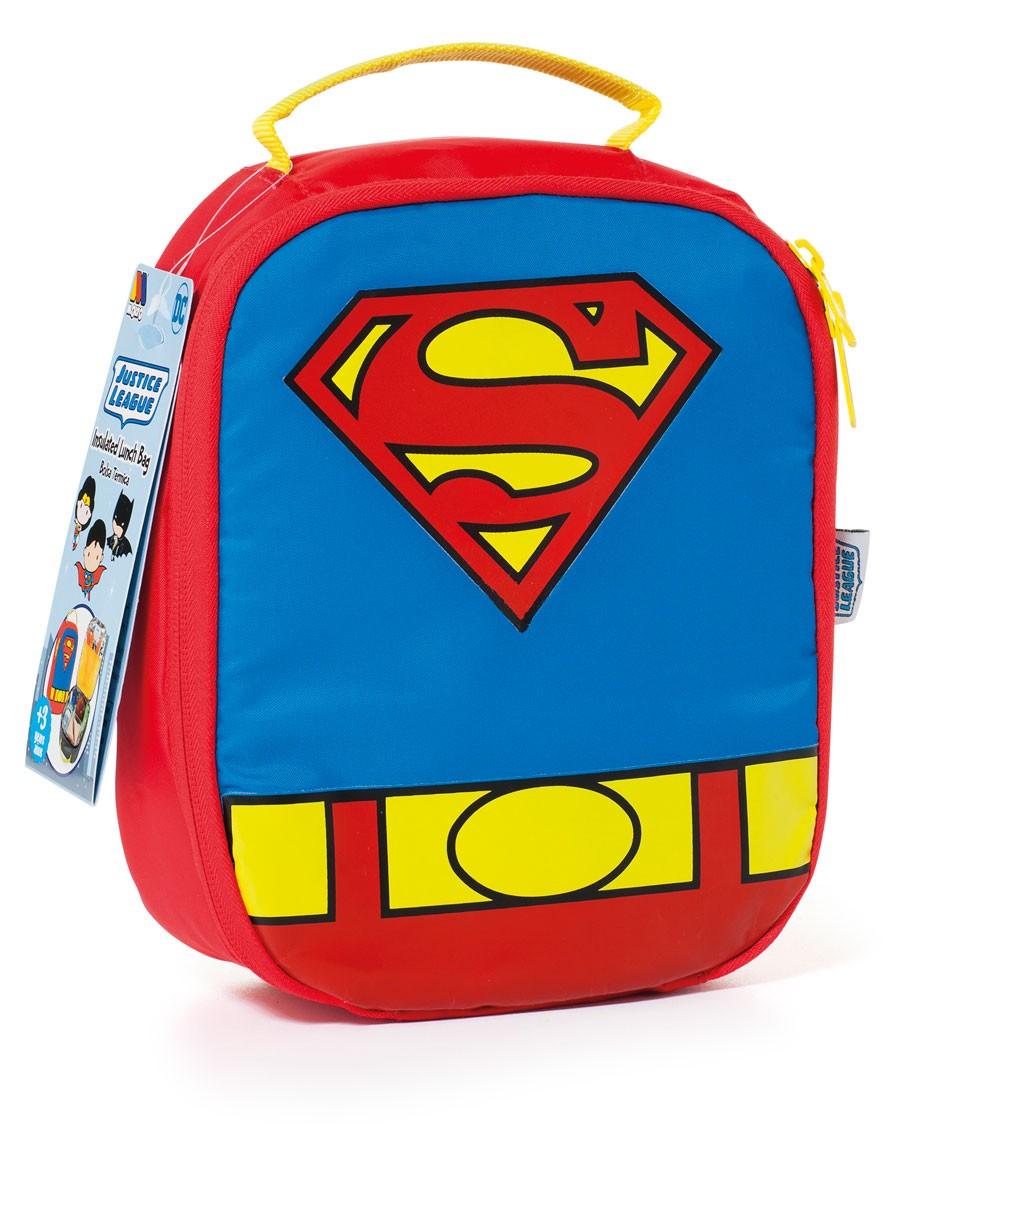 Bolsa de almuerzo Superman